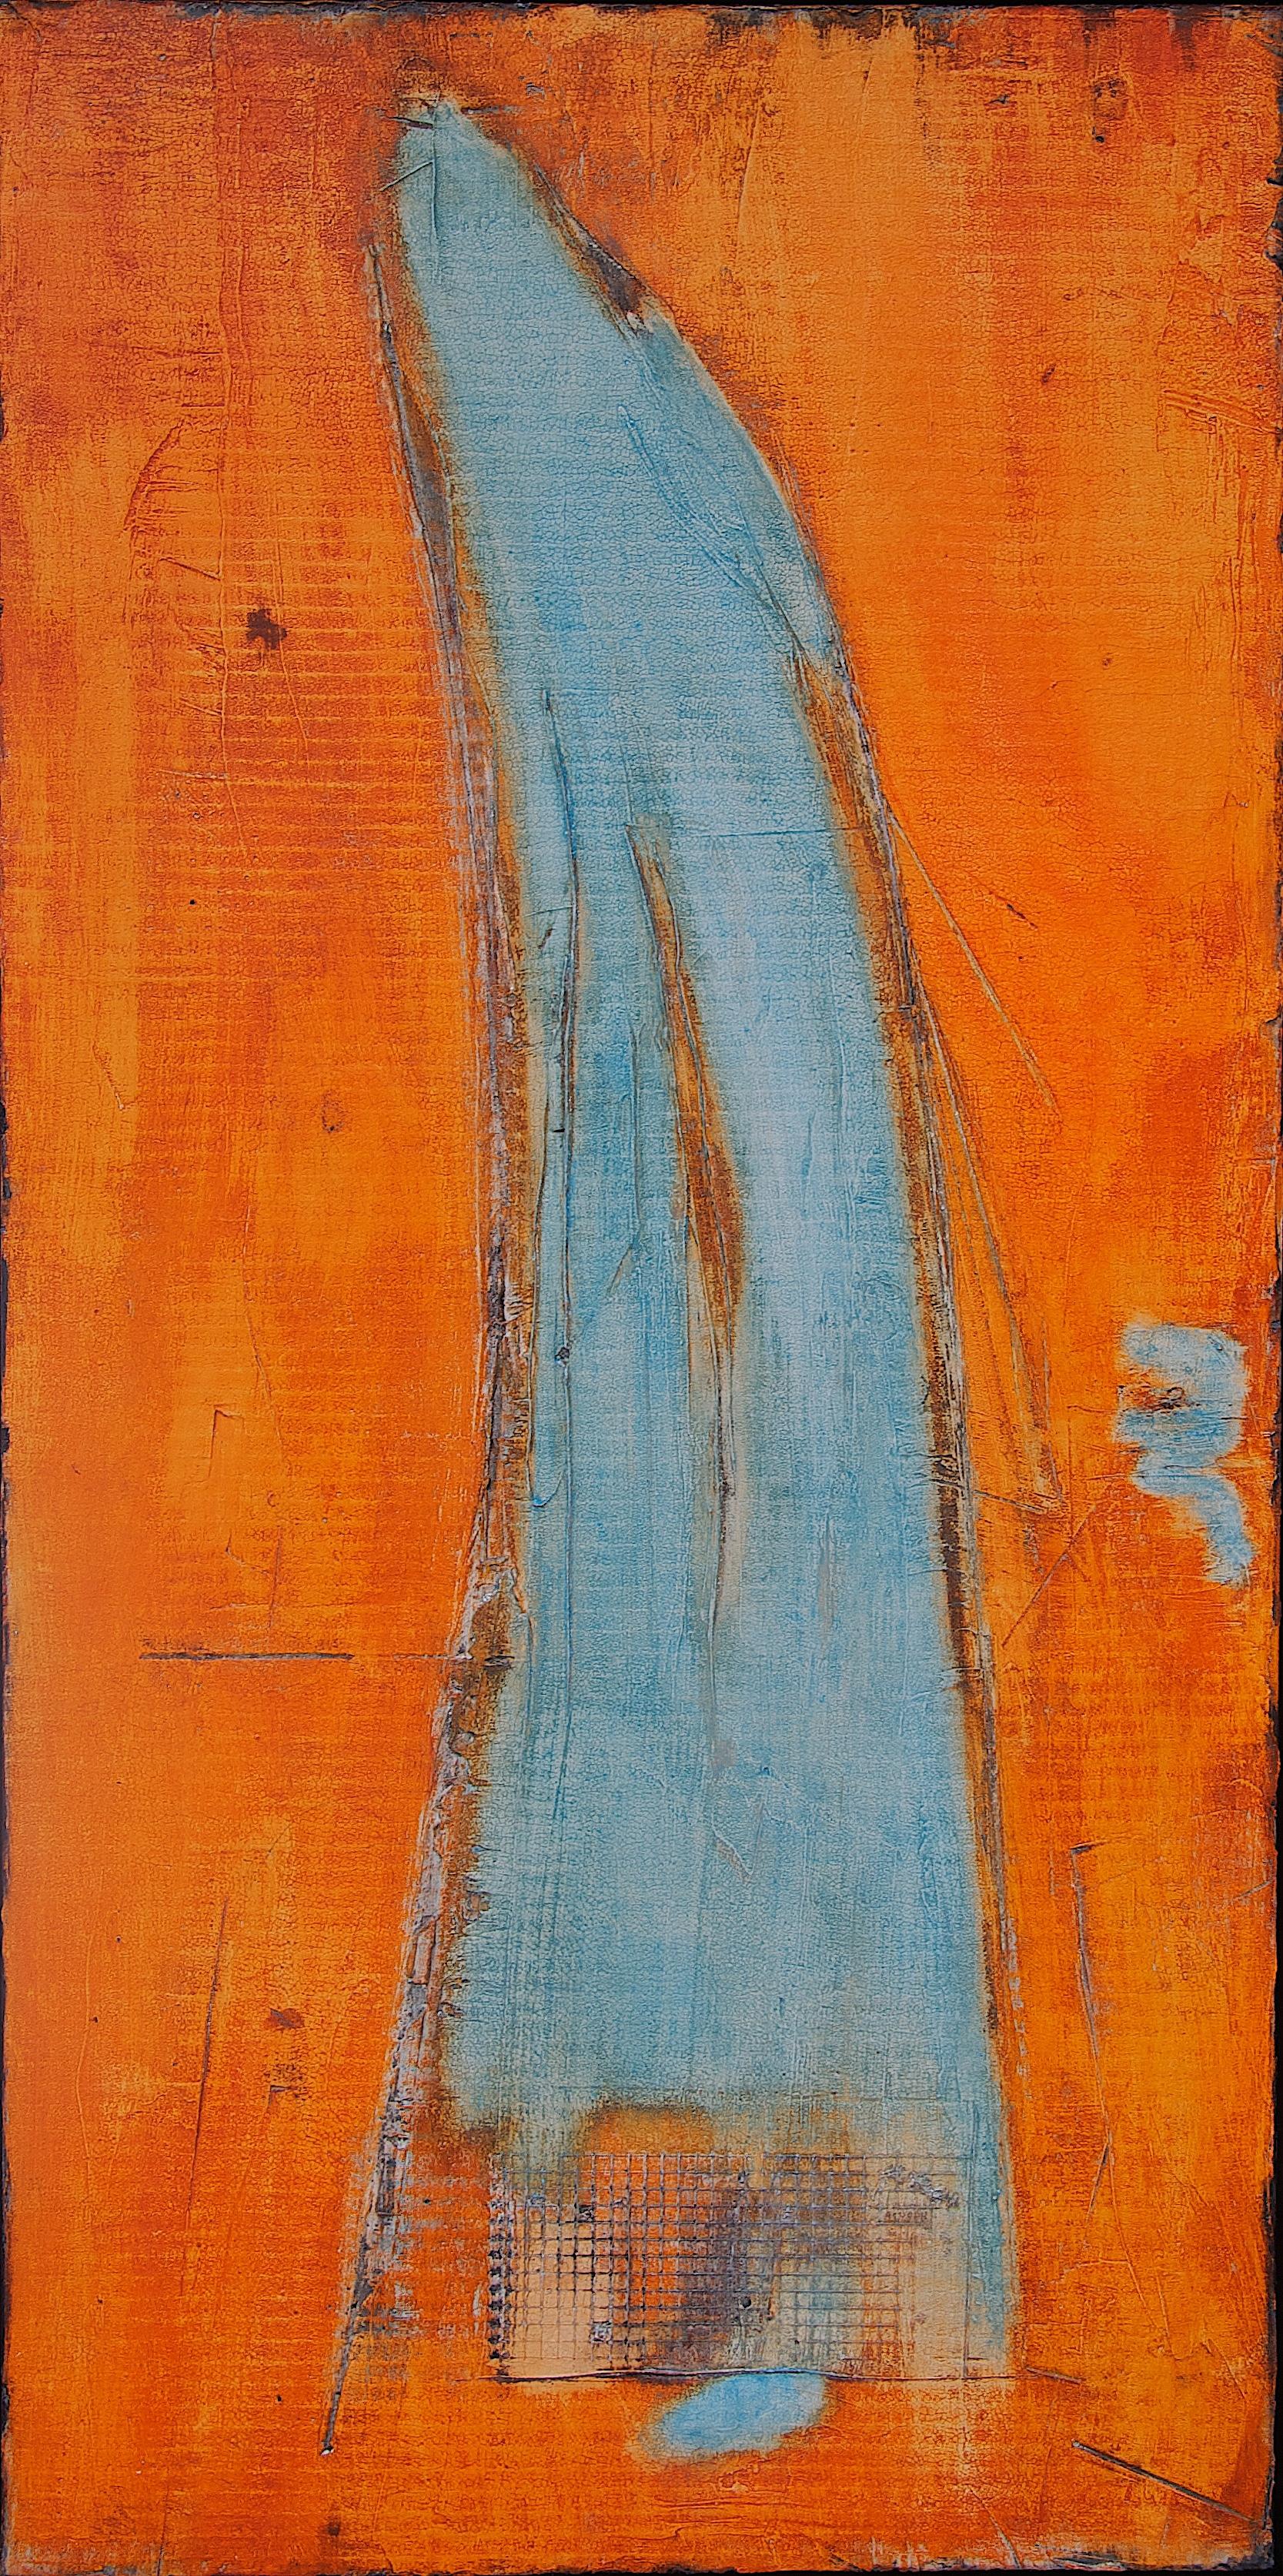 Fresko/Intonaco_ Sumpfkalk_Pigmente_Wachs_Bauplatte_60 x 120 cm